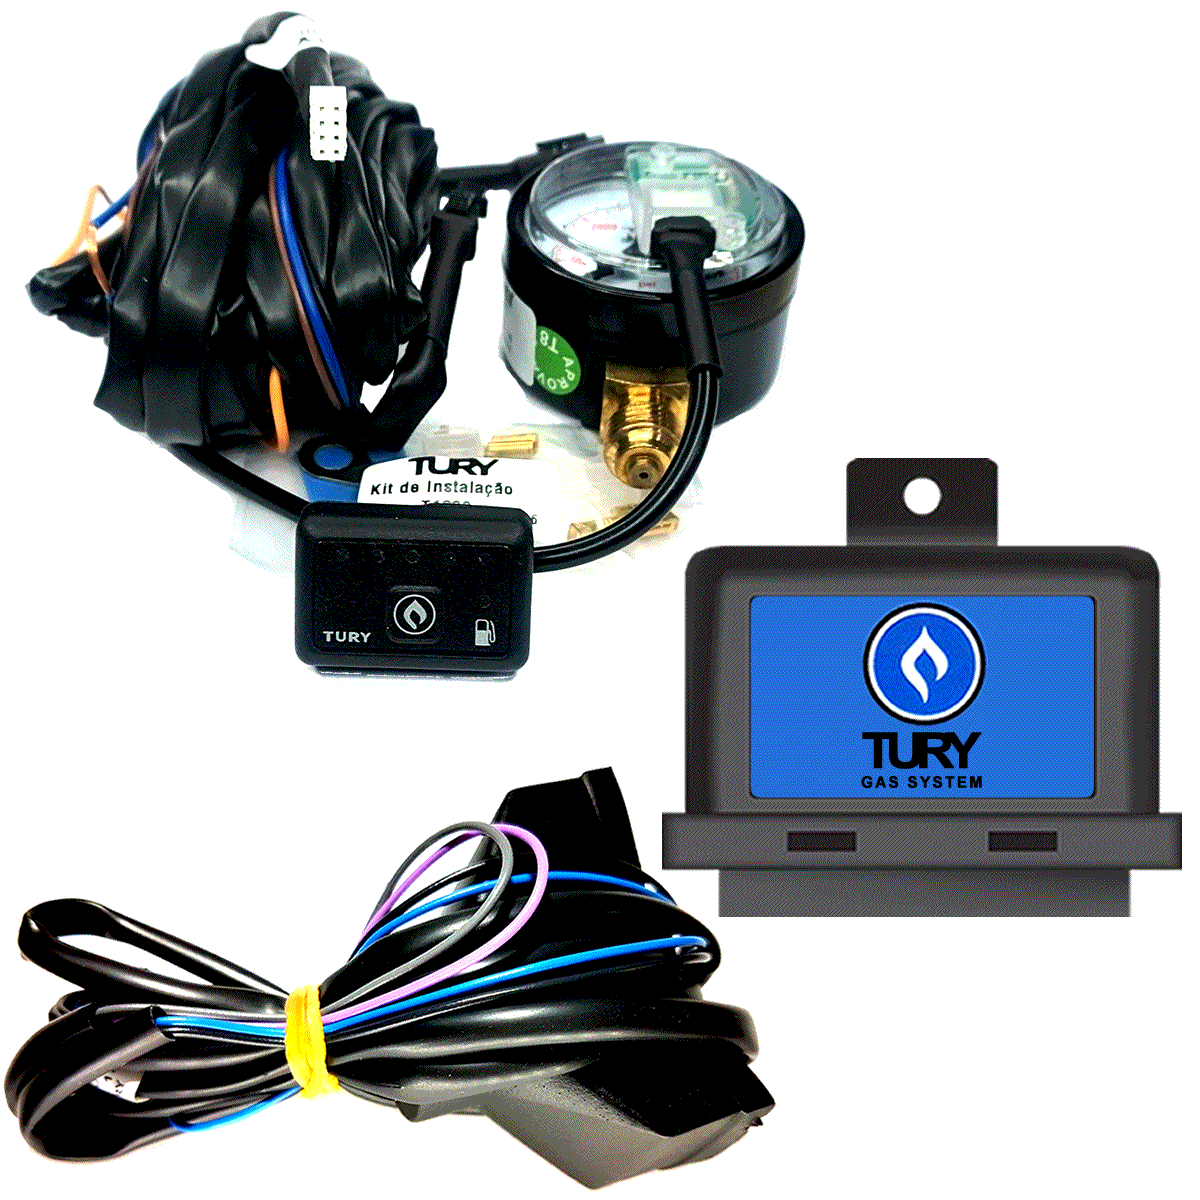 Chave Comutadora T1200A e Simulador de Sonda T65 TURY GAS